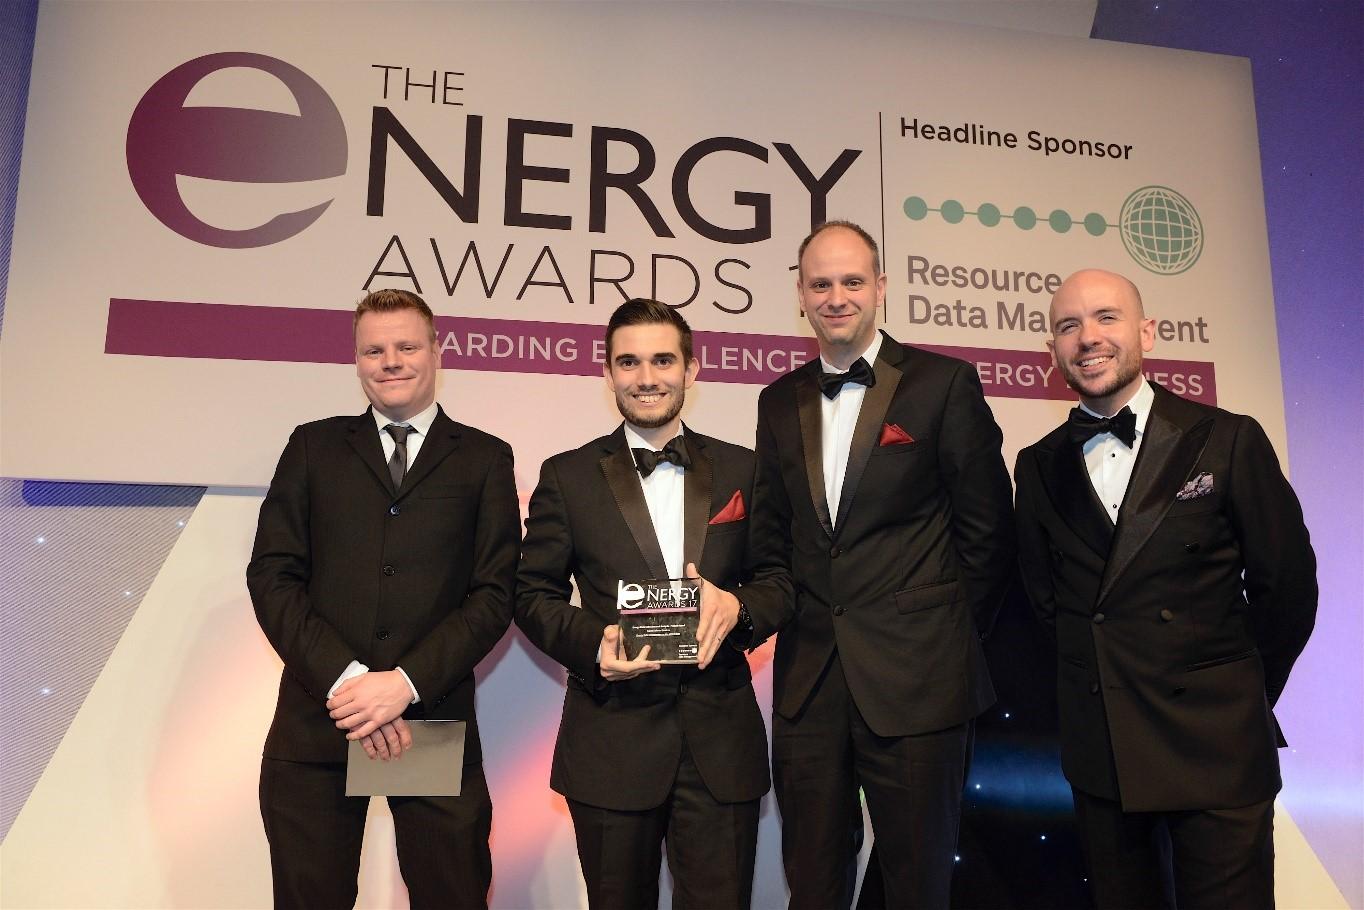 ADSL Energy Award